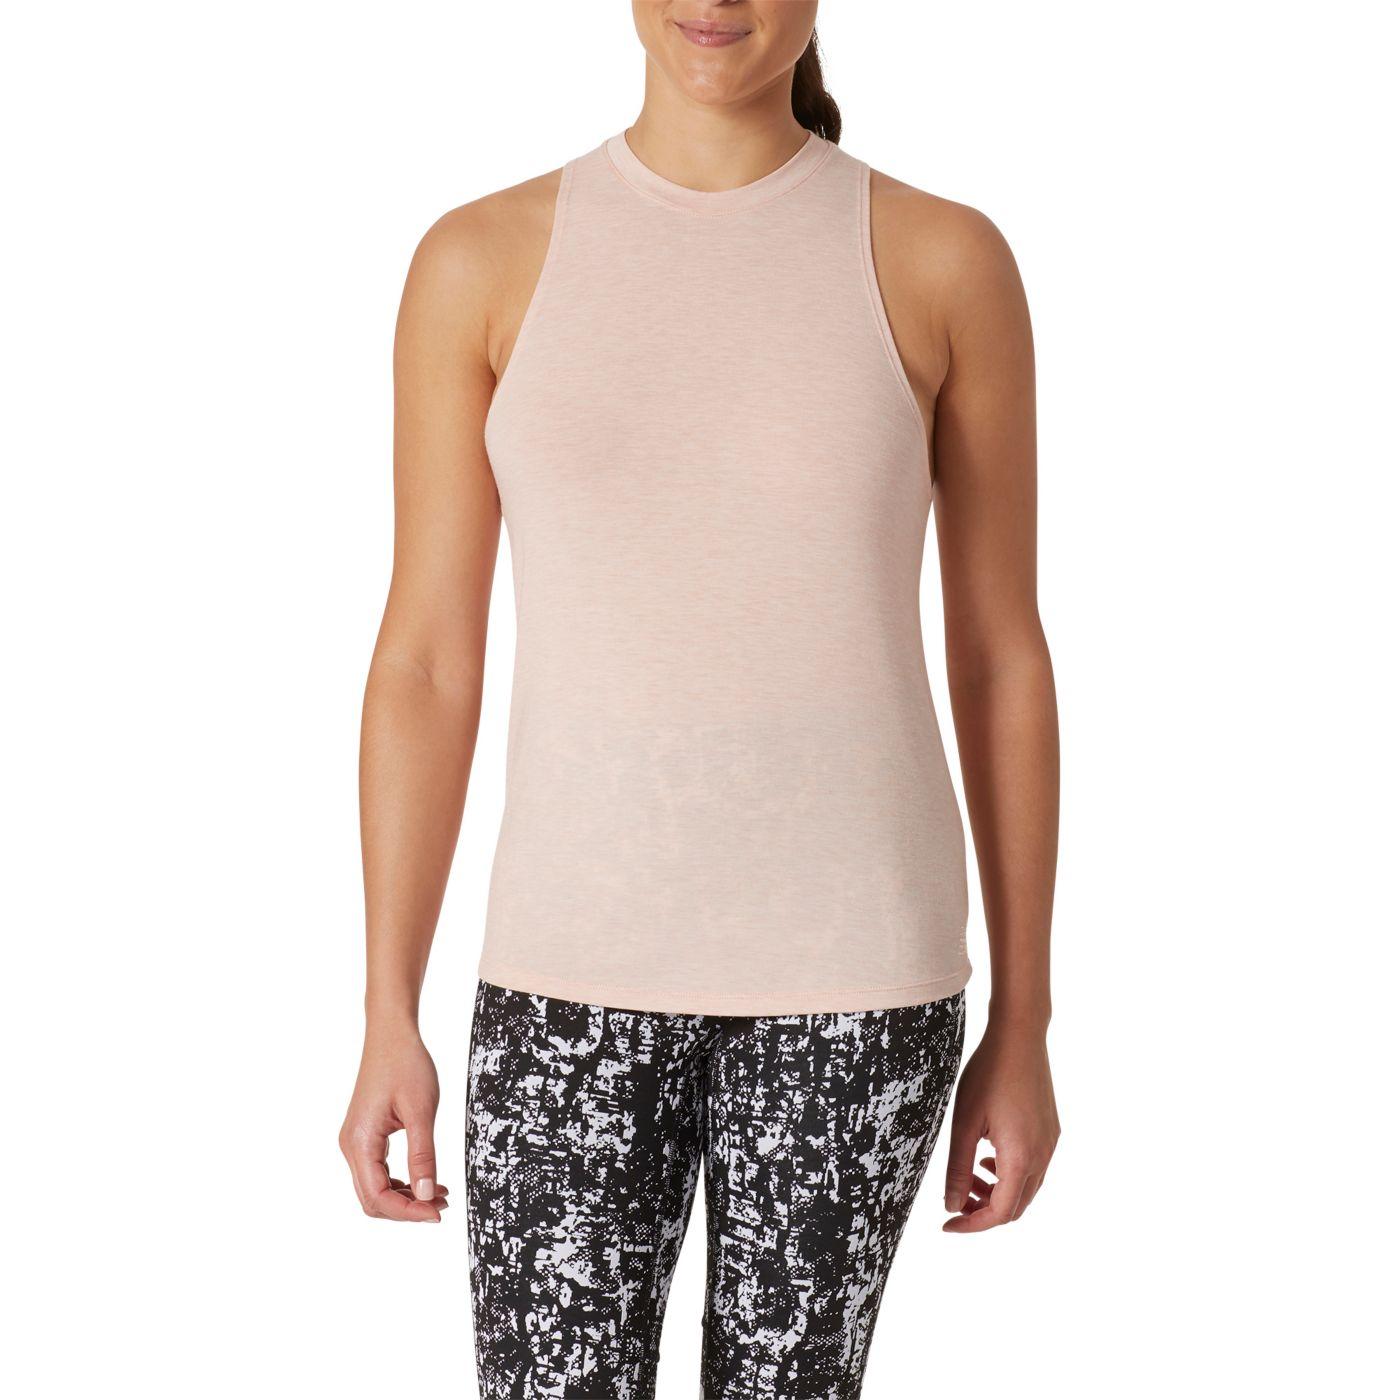 New Balance Women's Transform Jersey Twist Tank Top